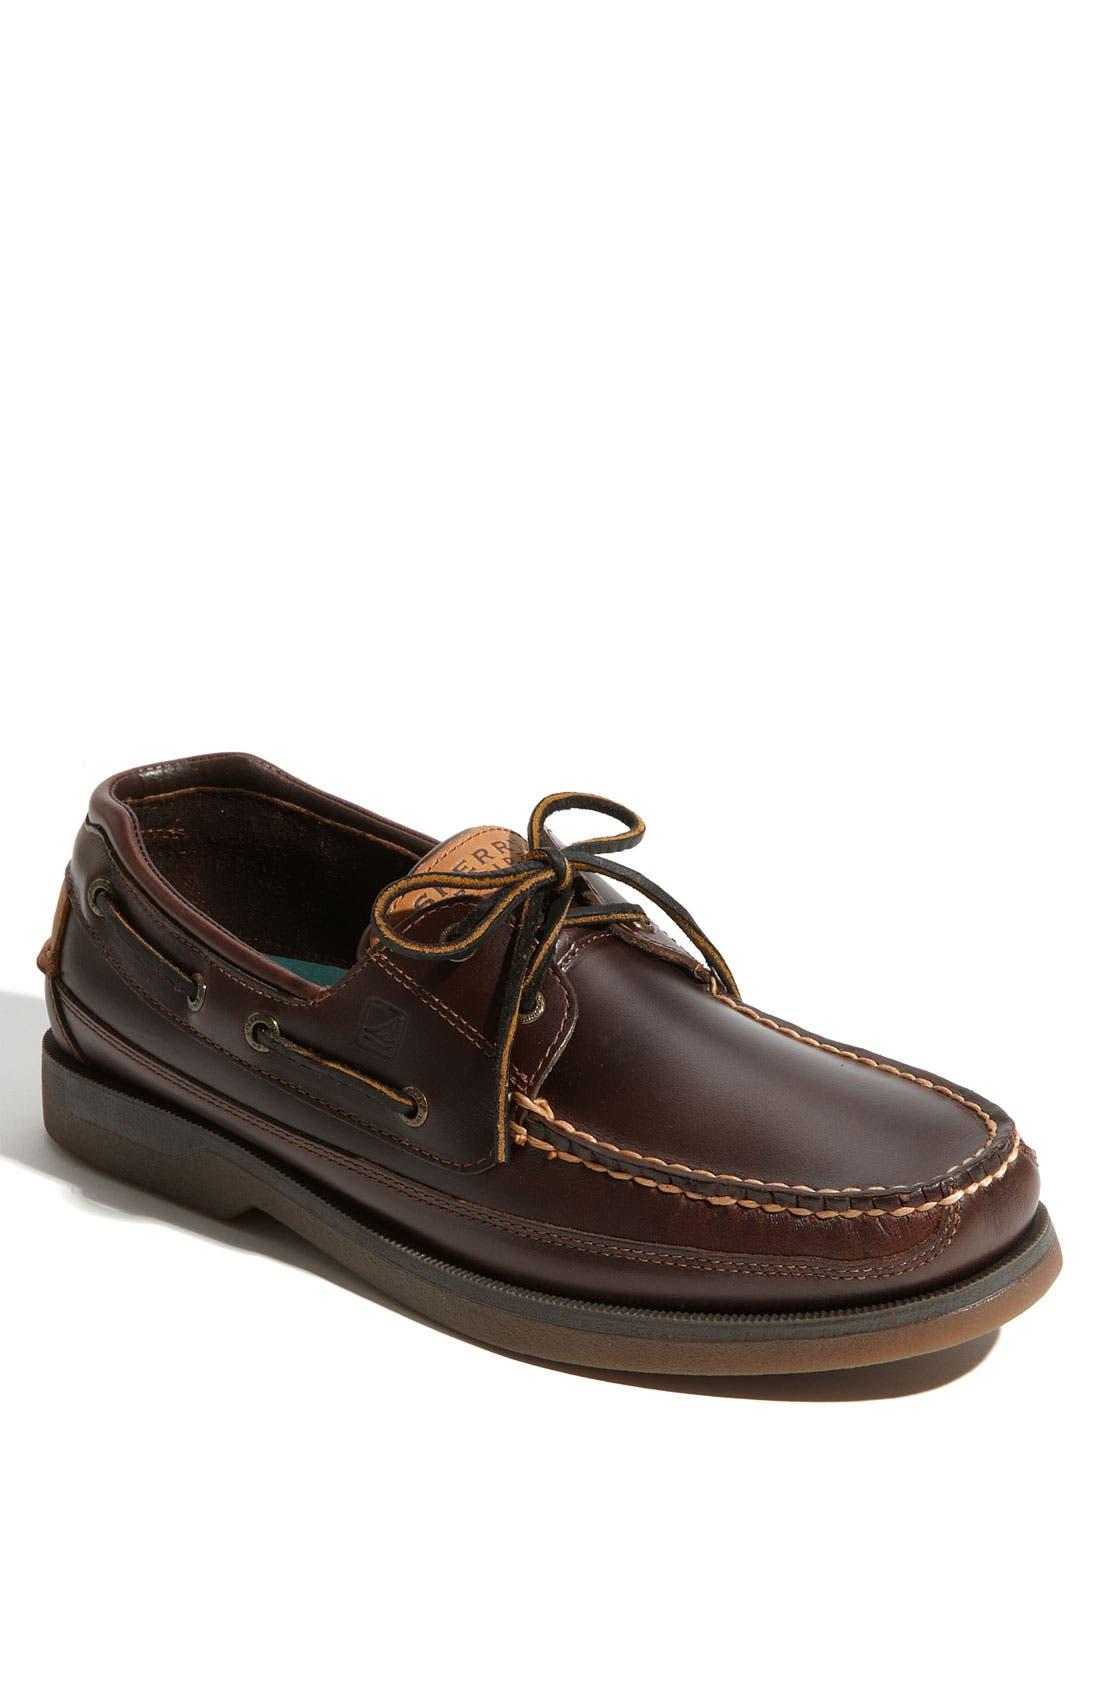 Top-Sider<sup>®</sup> 'Mako Two-Eye Canoe Moc' Boat Shoe,                         Main,                         color, Dark Brown